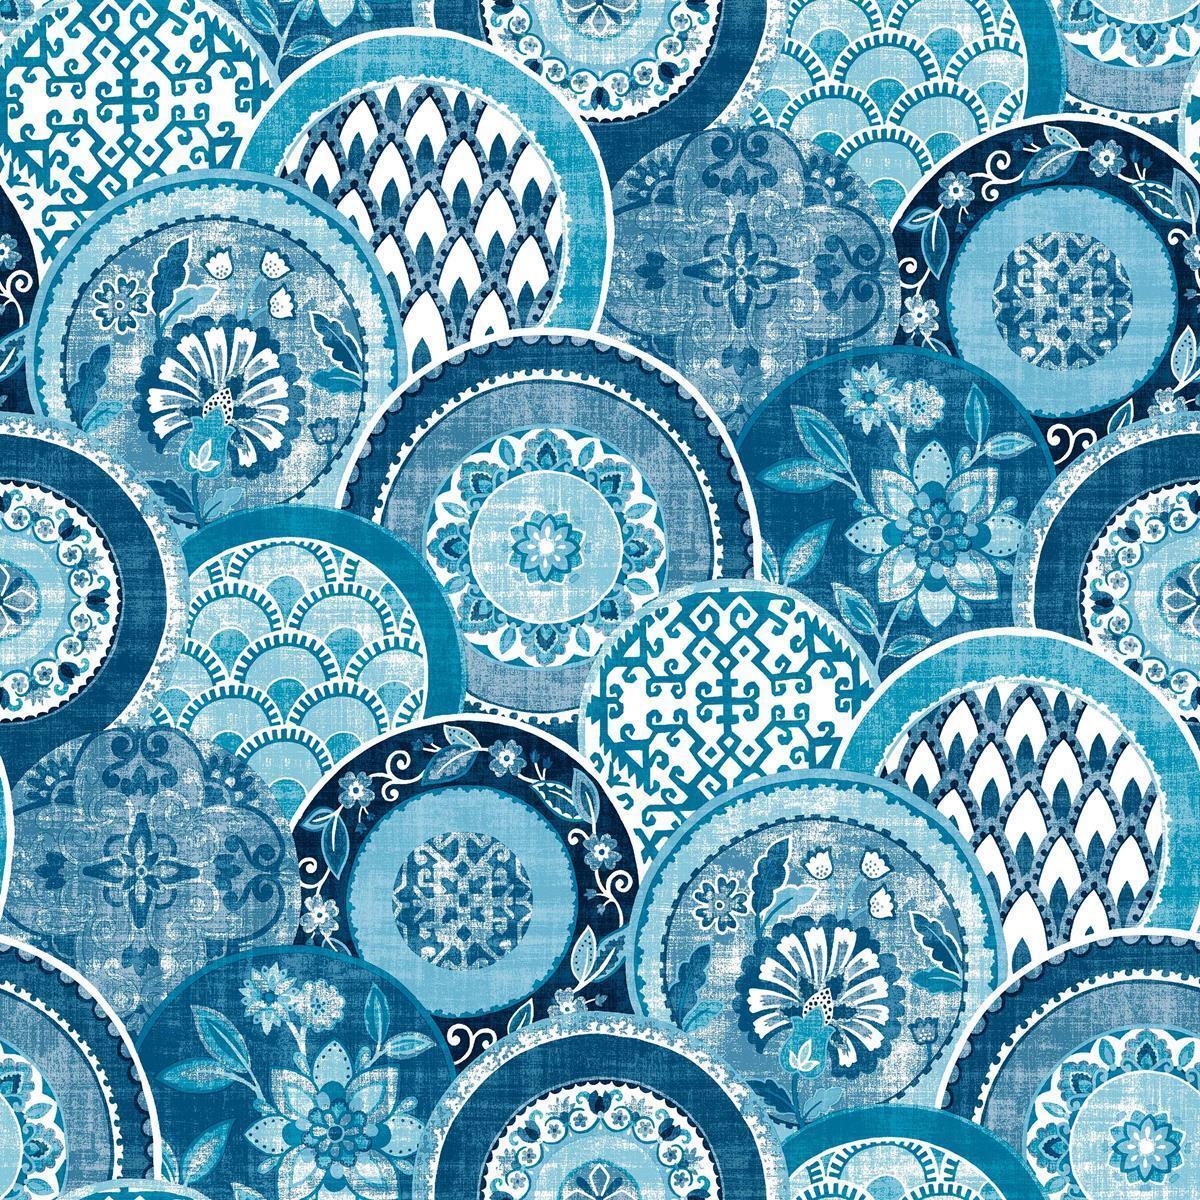 FD24148 - Solstice Old Plates bluee Fine Decor Wallpaper